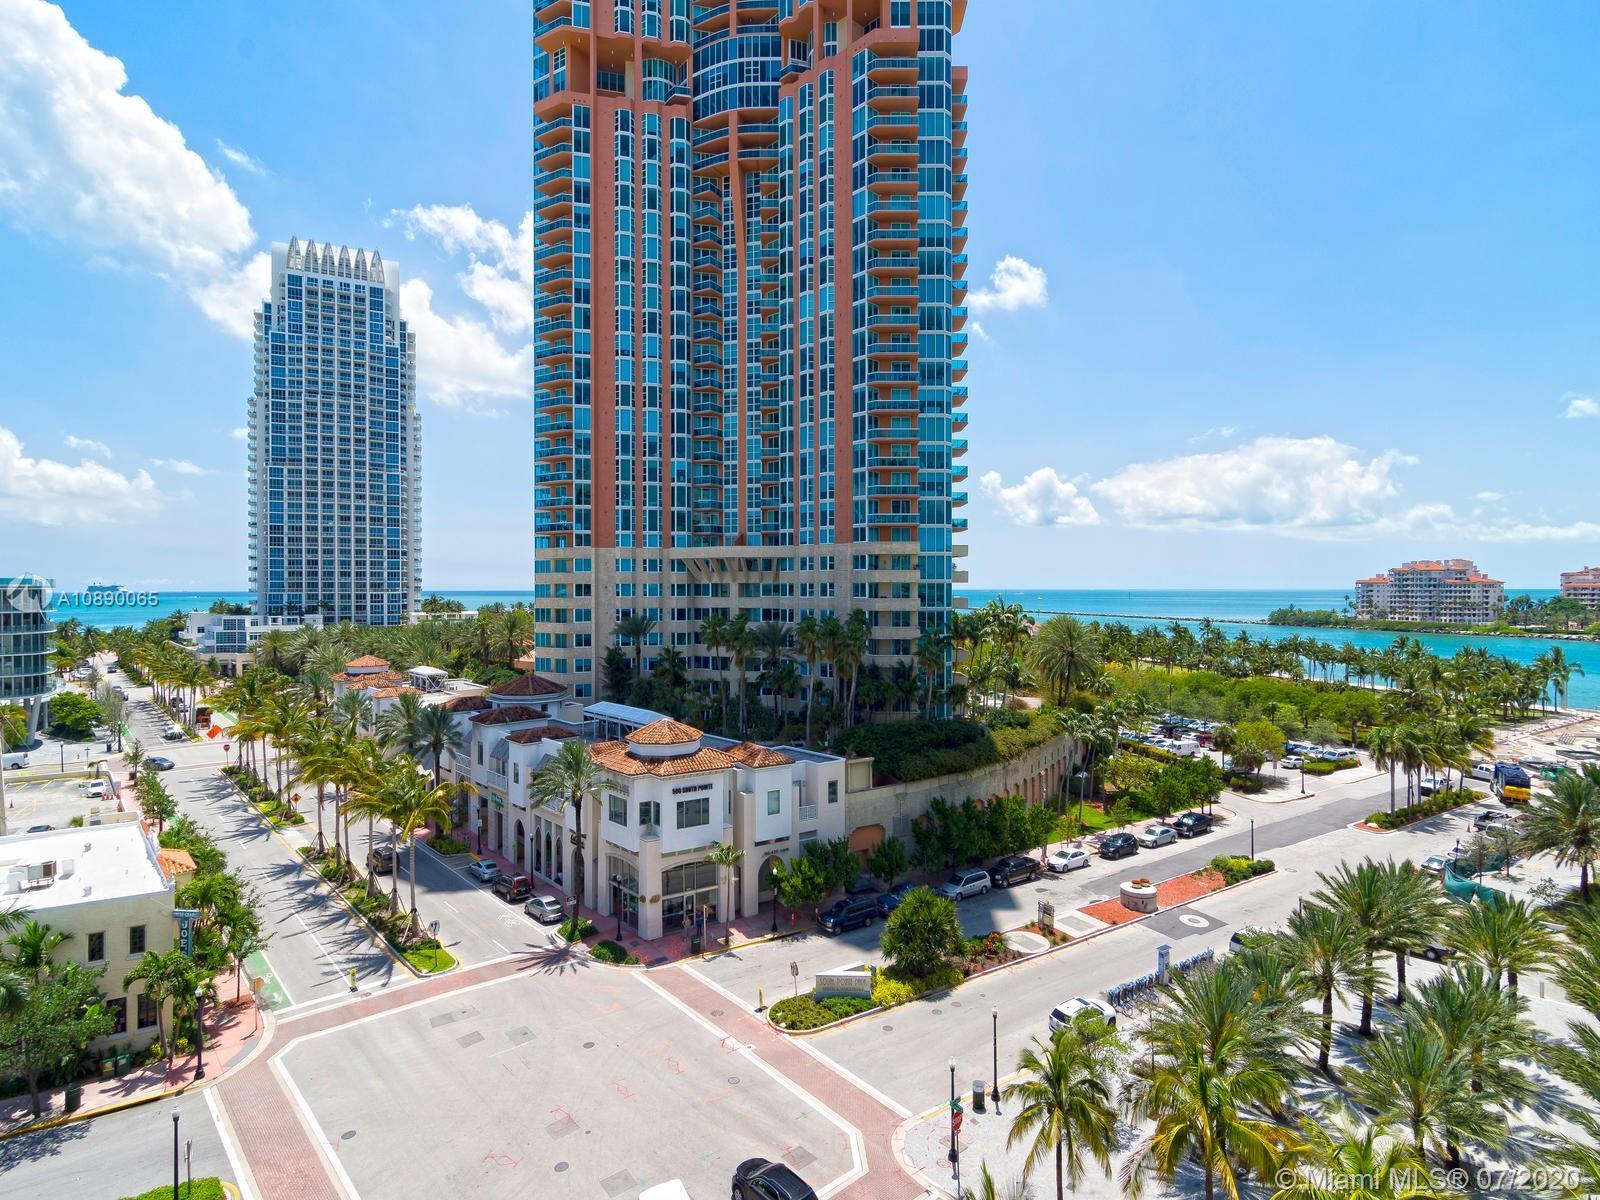 801 S Pointe Dr, Unit #PH3 Luxury Real Estate